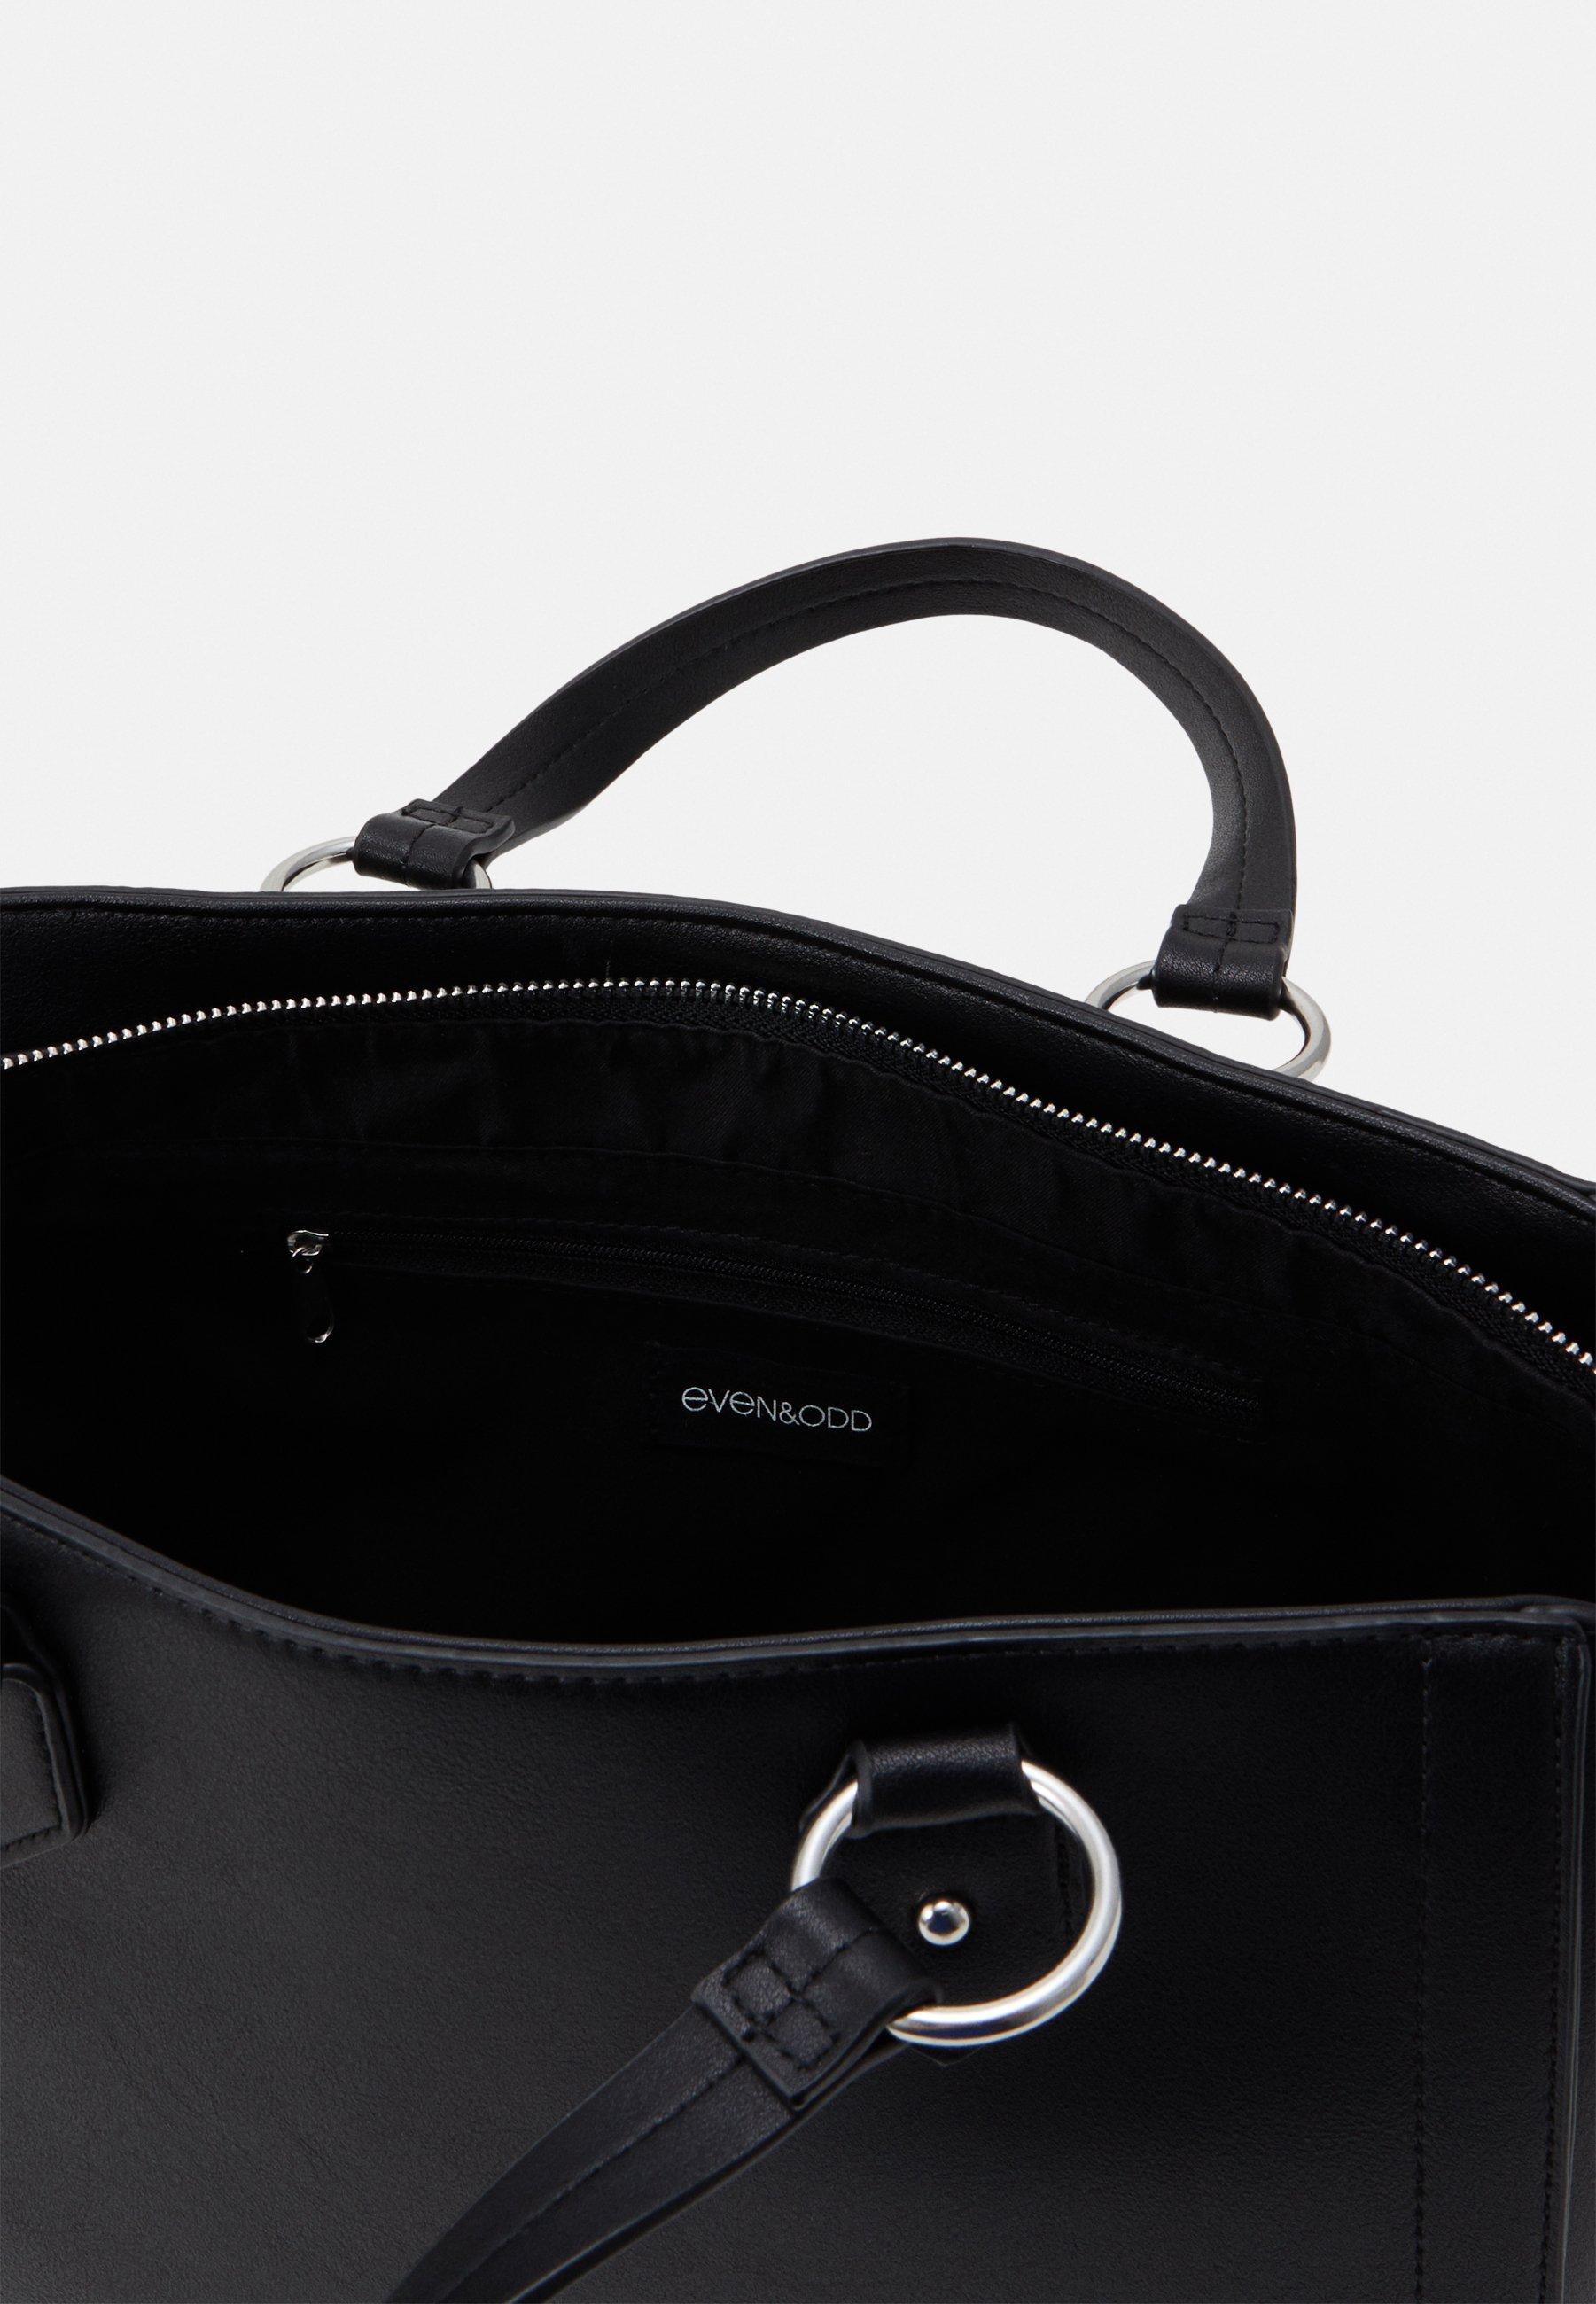 Even&odd Shopping Bags - Black